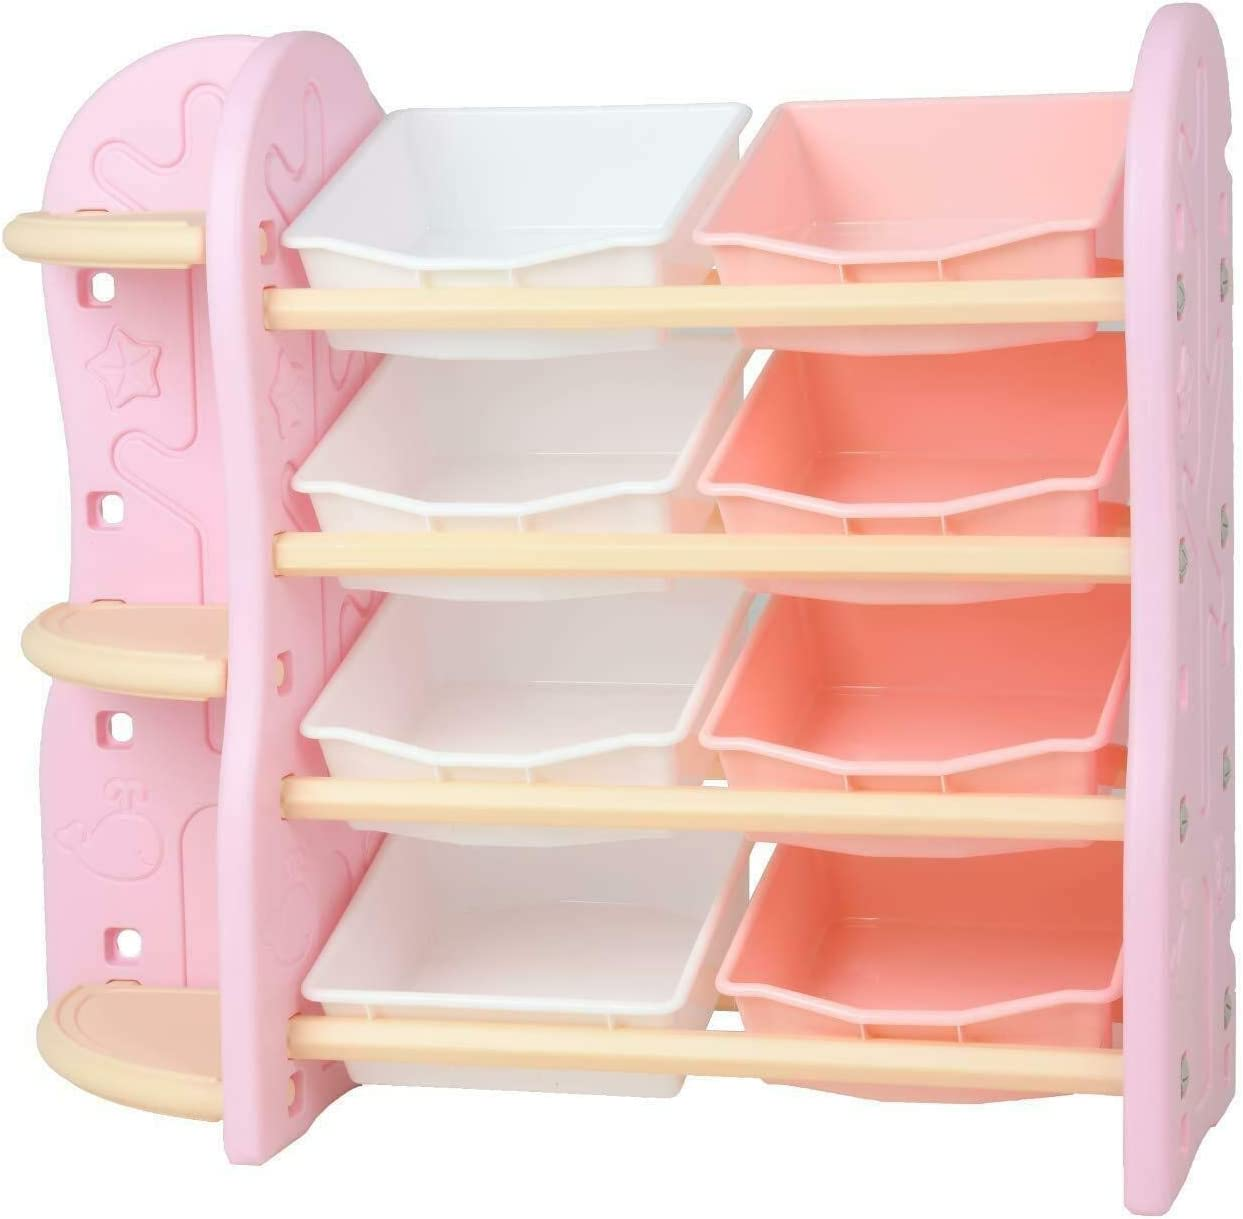 YIE Uenjoy 2 in 1 Toy shop Storage Rack Drawers 8 Max 70% OFF Corner